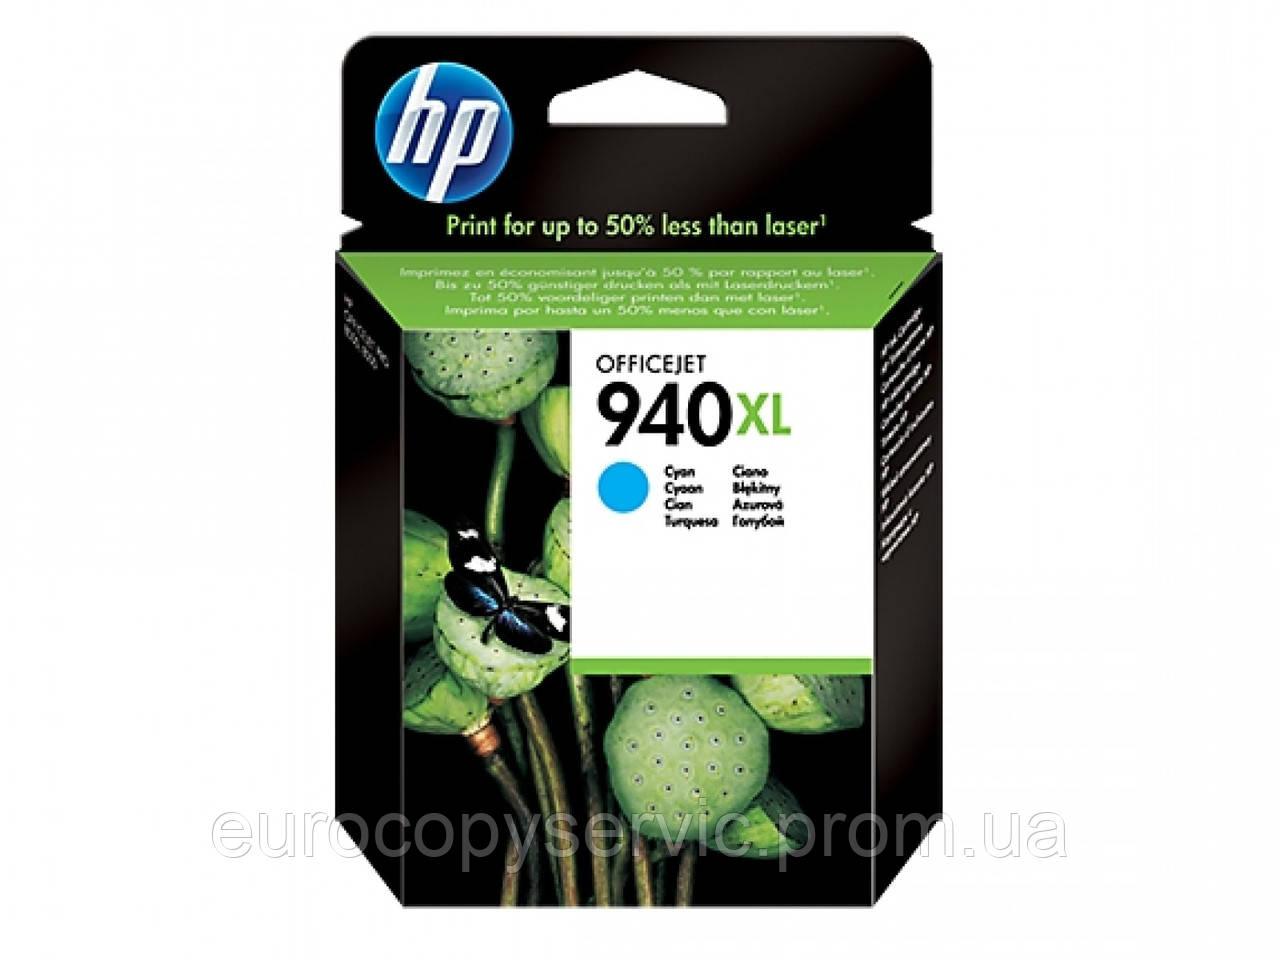 Картридж HP No.940XL OfficeJet Pro 8000 / 8500 XL Cyan (C4907AE)